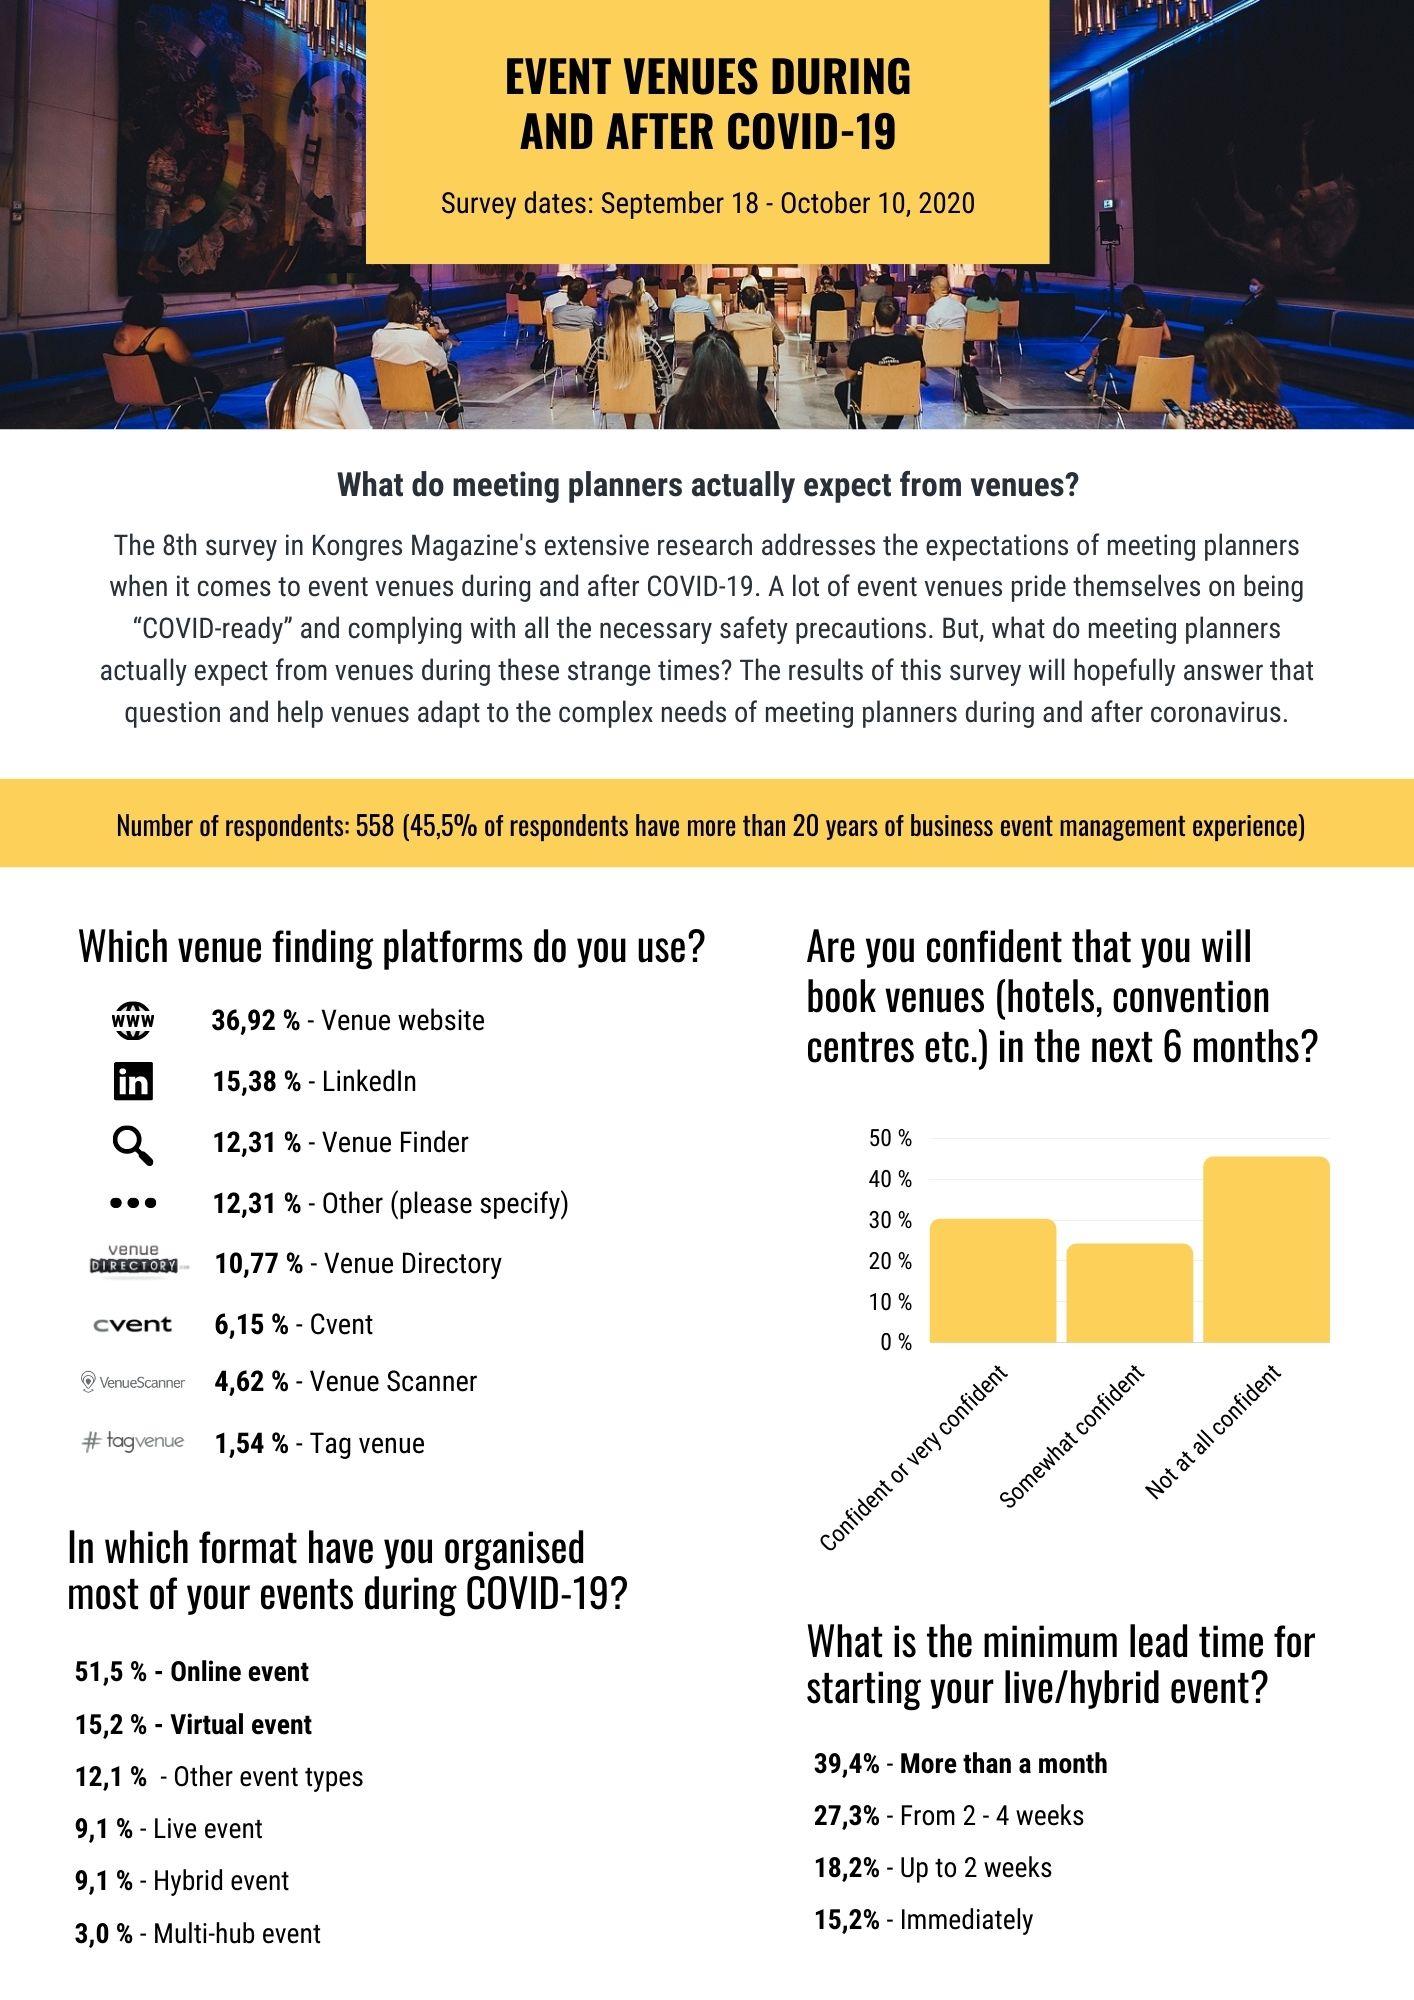 kongres-magazine-survey-covid-venues-events